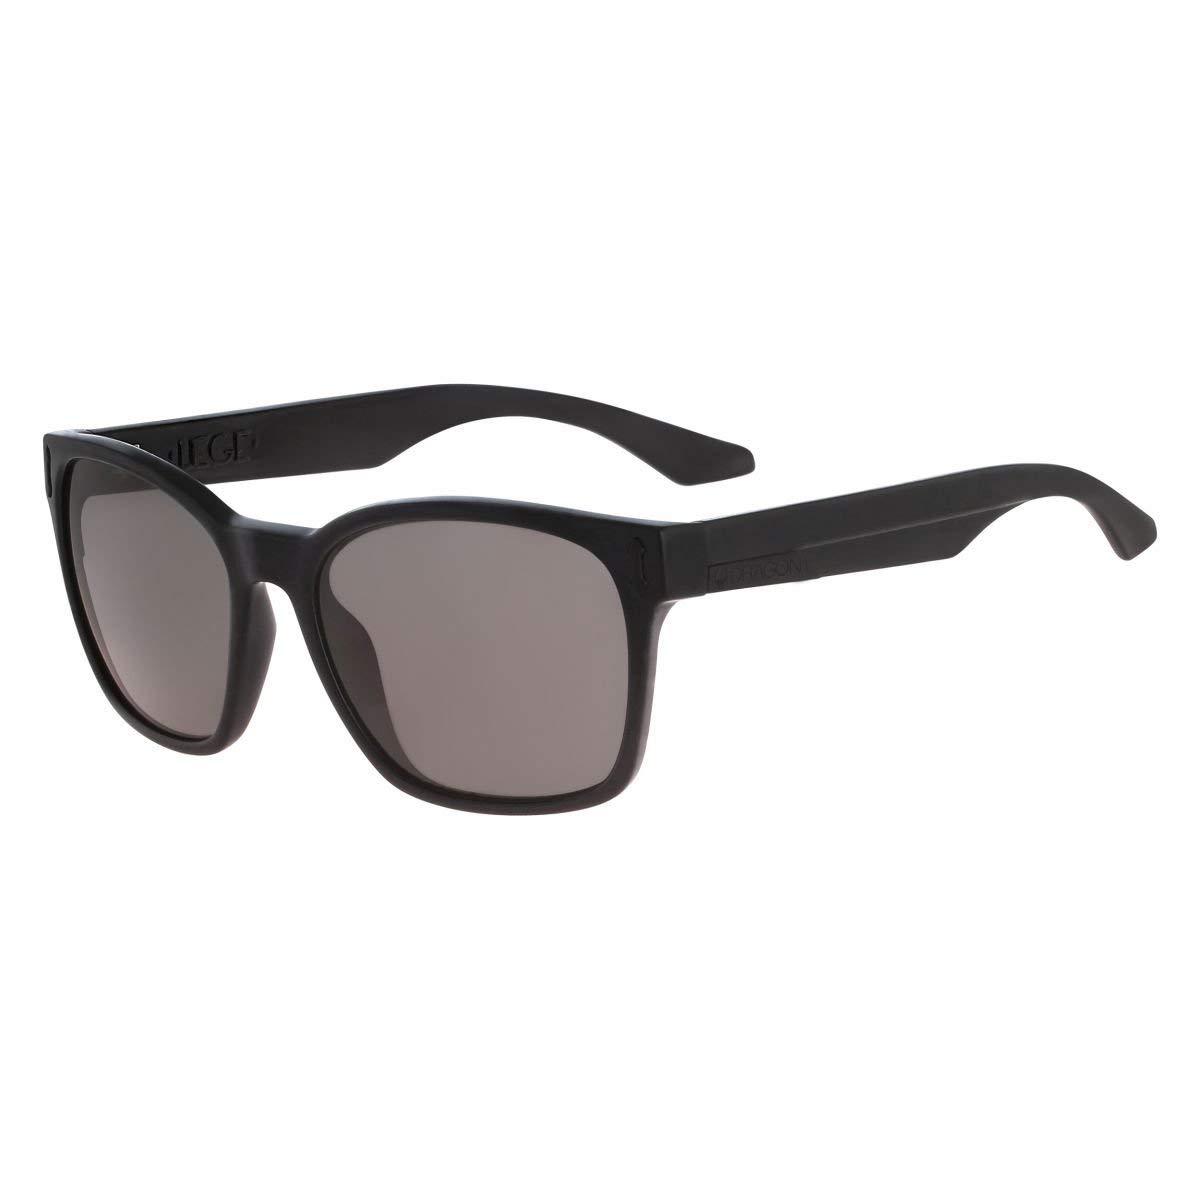 37059eeebb Get Quotations · Dragon Alliance Liege Sunglasses